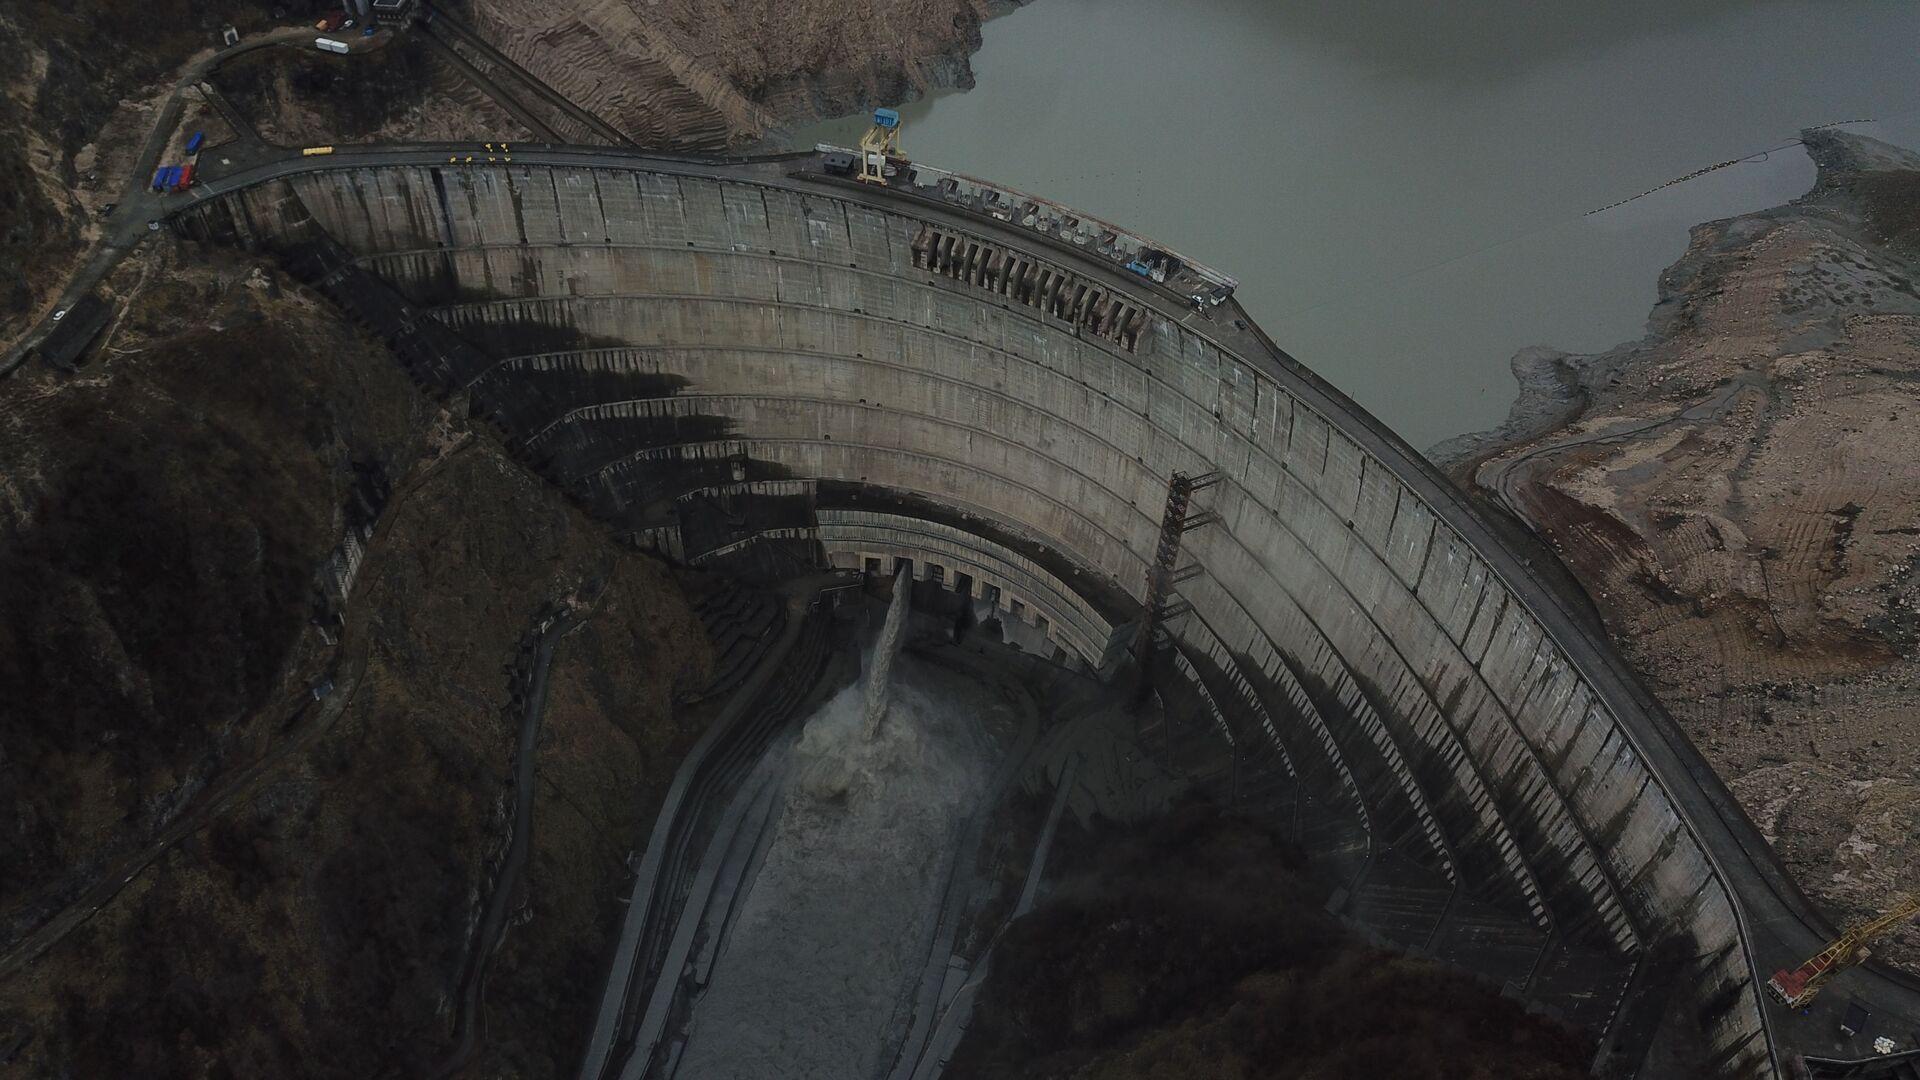 Ингури ГЭС - вид сверху на водохранилище и плотину - Sputnik Грузия, 1920, 01.09.2021